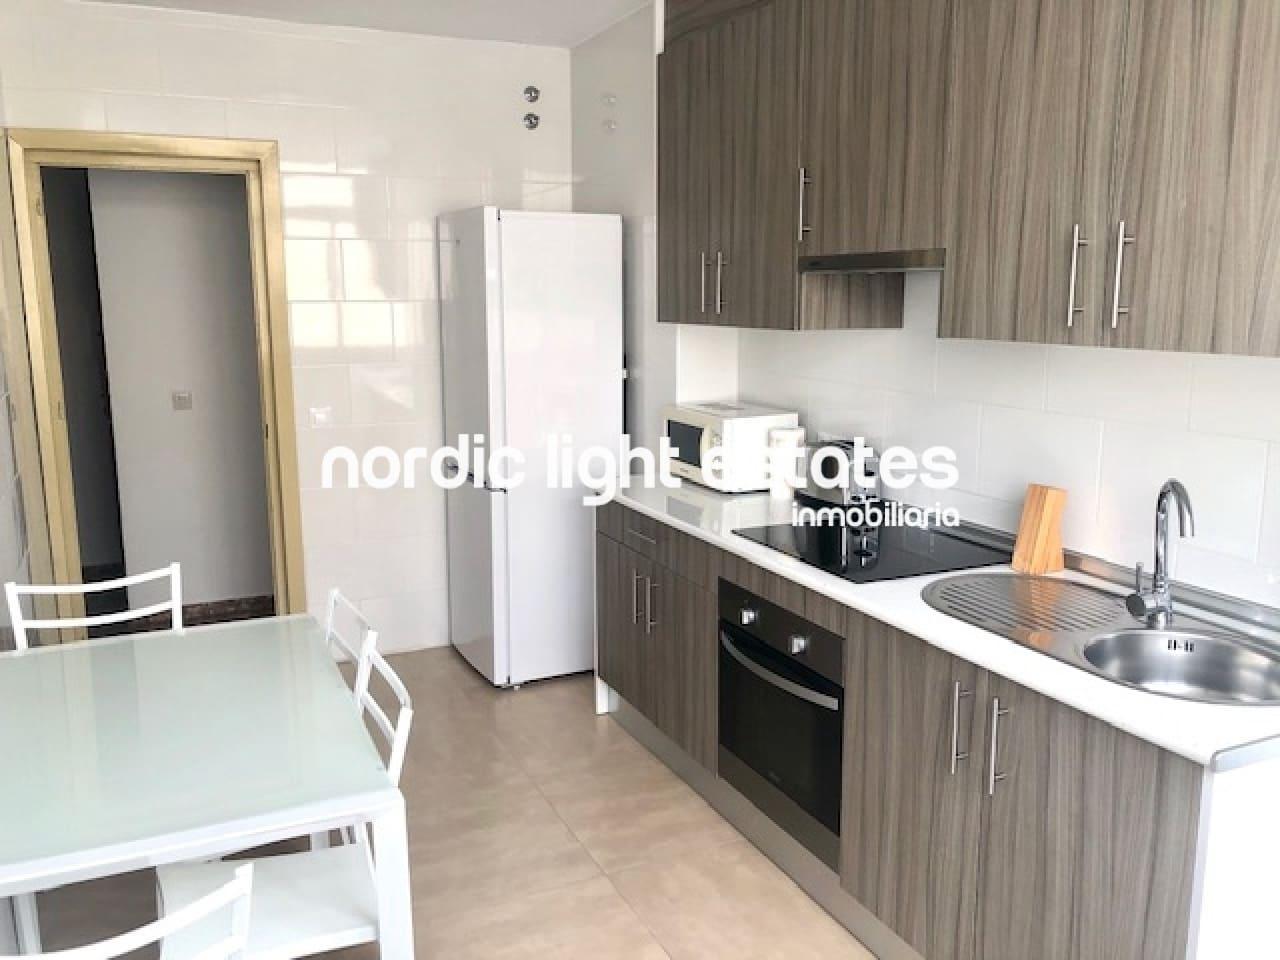 3 bedroom Flat for rent in Nerja - € 650 (Ref: 5711910)